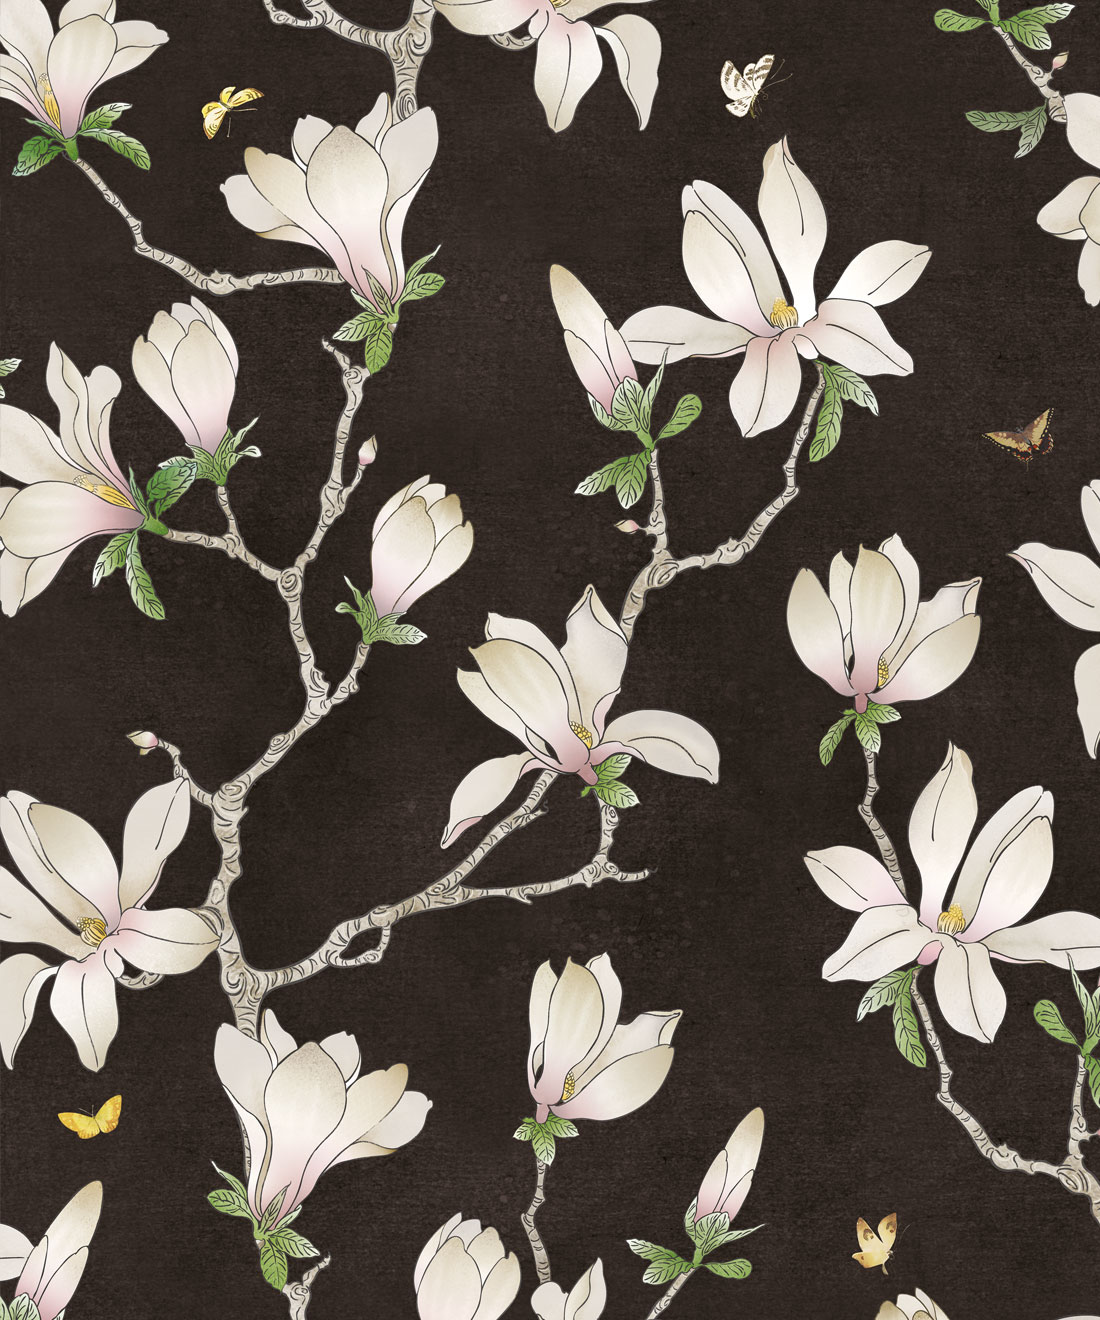 Floral Magnolia Wallpaper Large Floral Wallpaper Online Milton